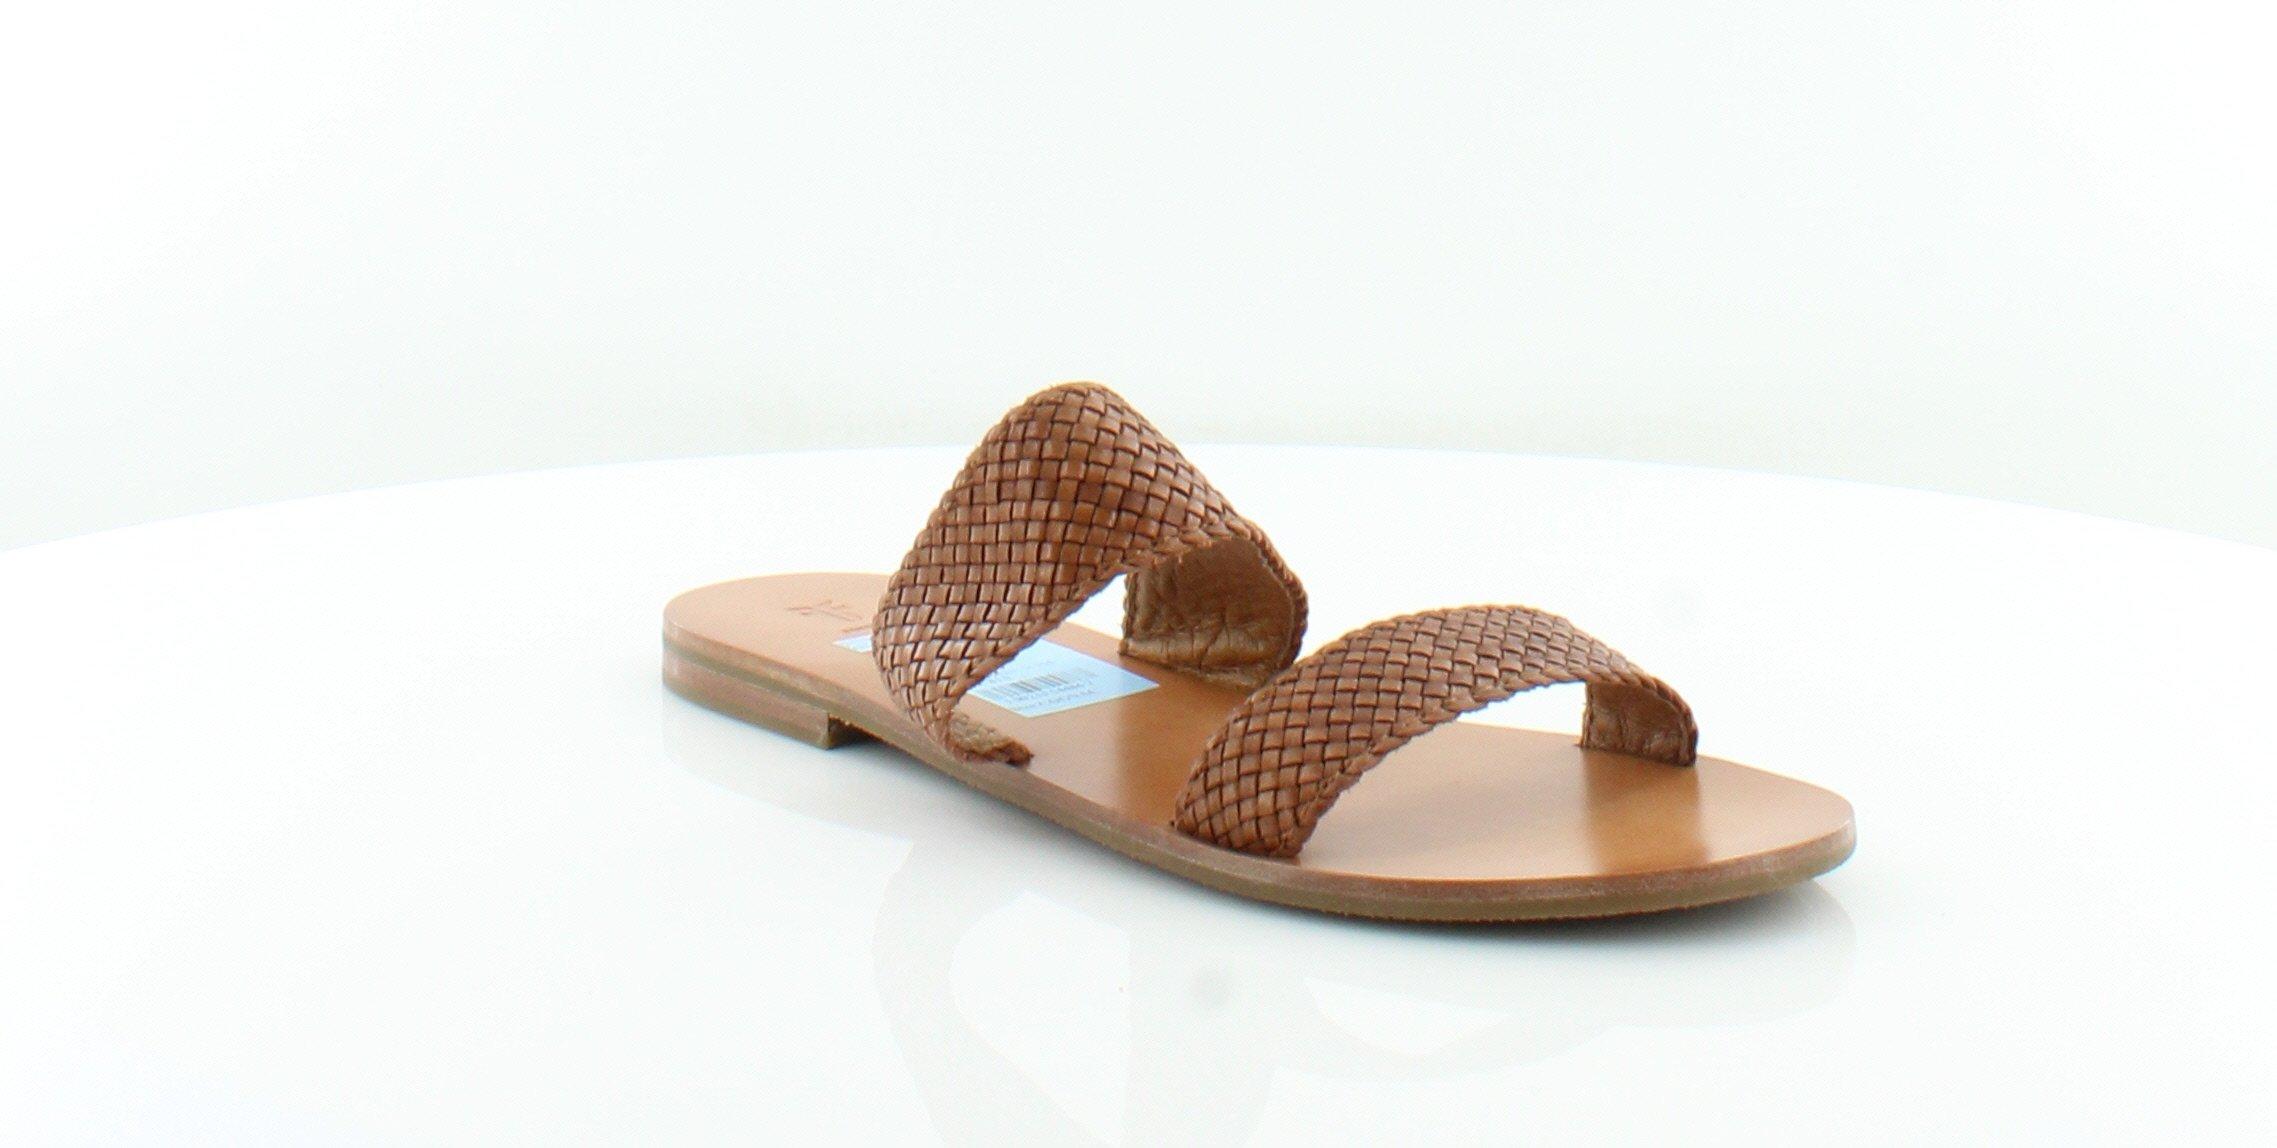 FRYE Women's Ruth Woven Ankle Gladiator Sandal, Cognac, 9.5 M US